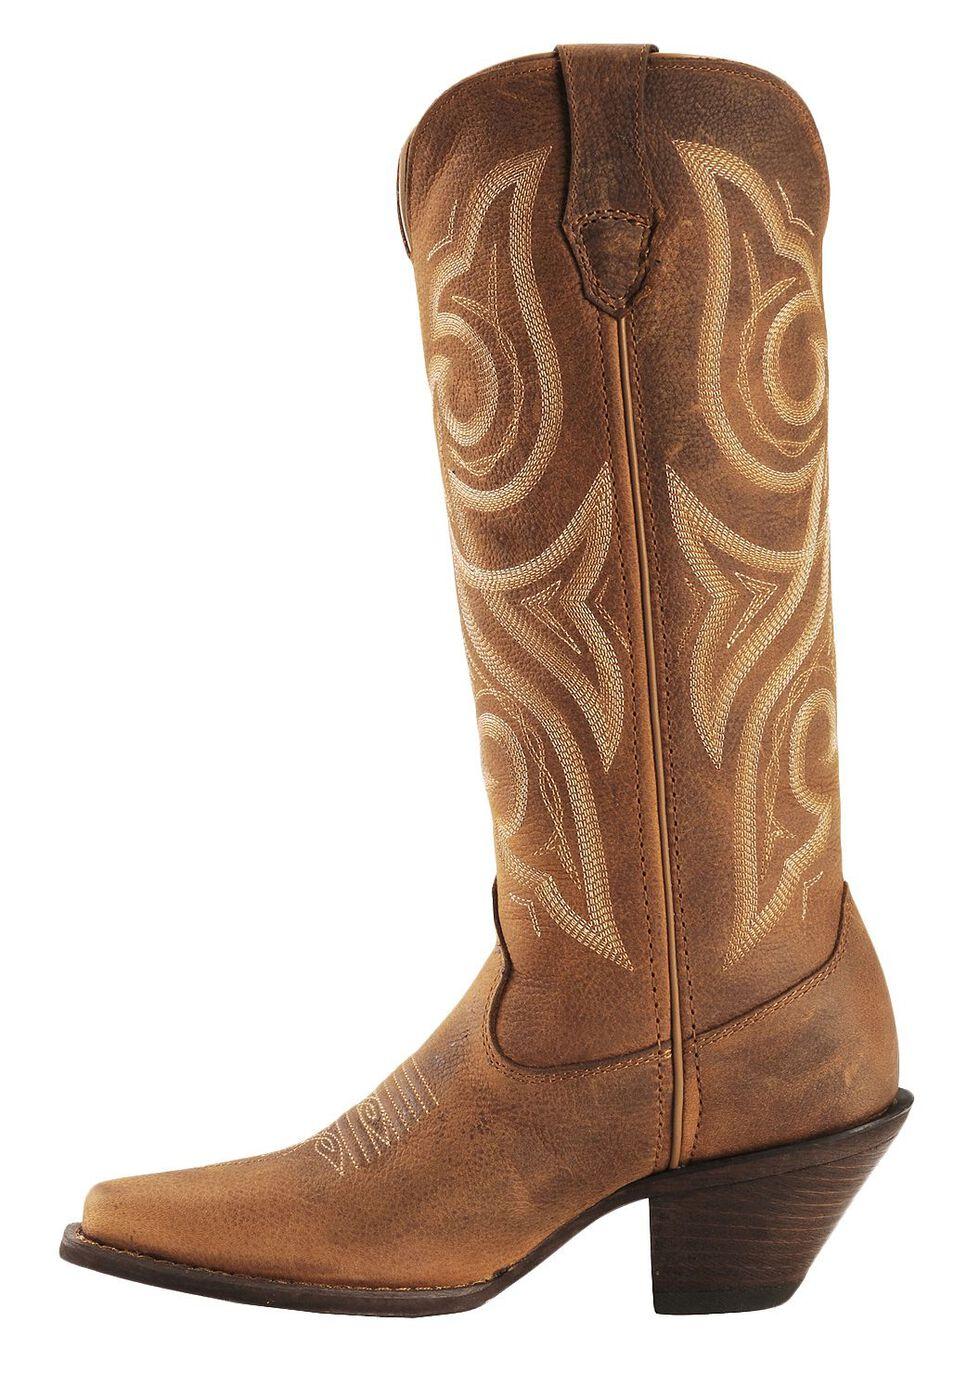 Crush by Durango Women's Jealousy Western Boots - Square Toe, Cognac, hi-res